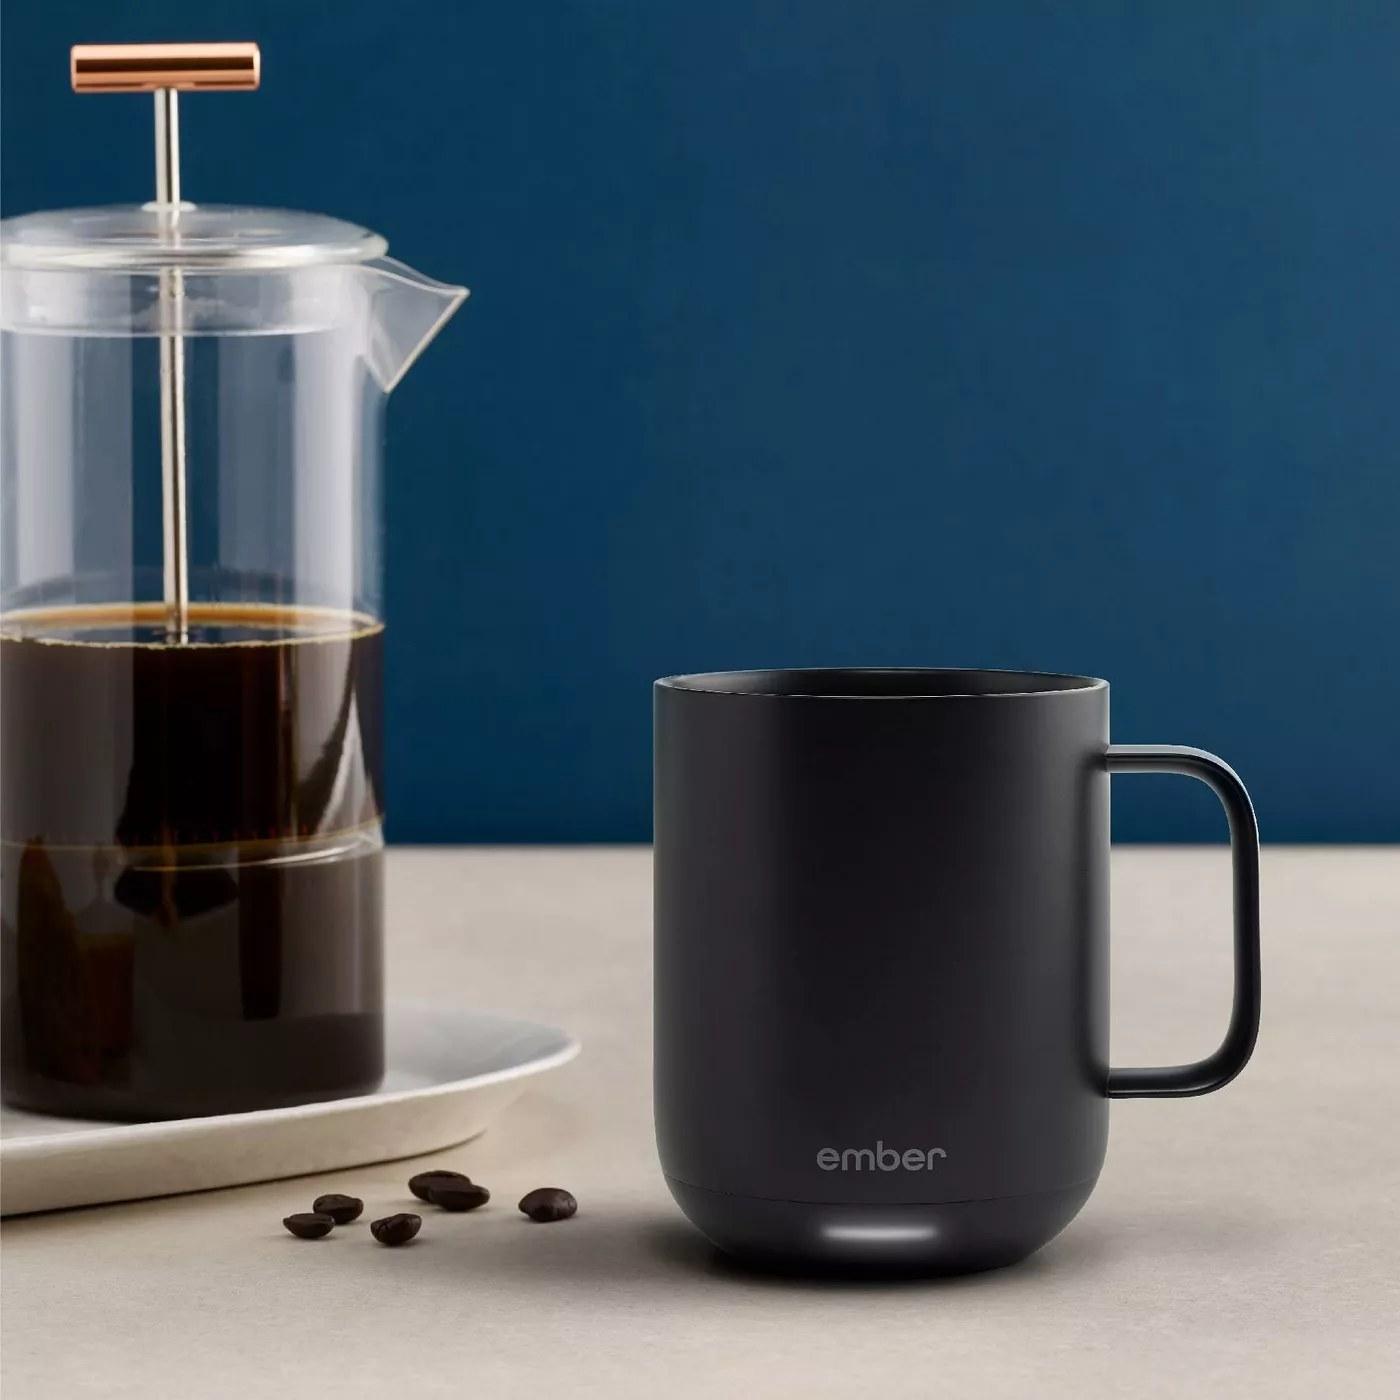 Black Ember smart mug